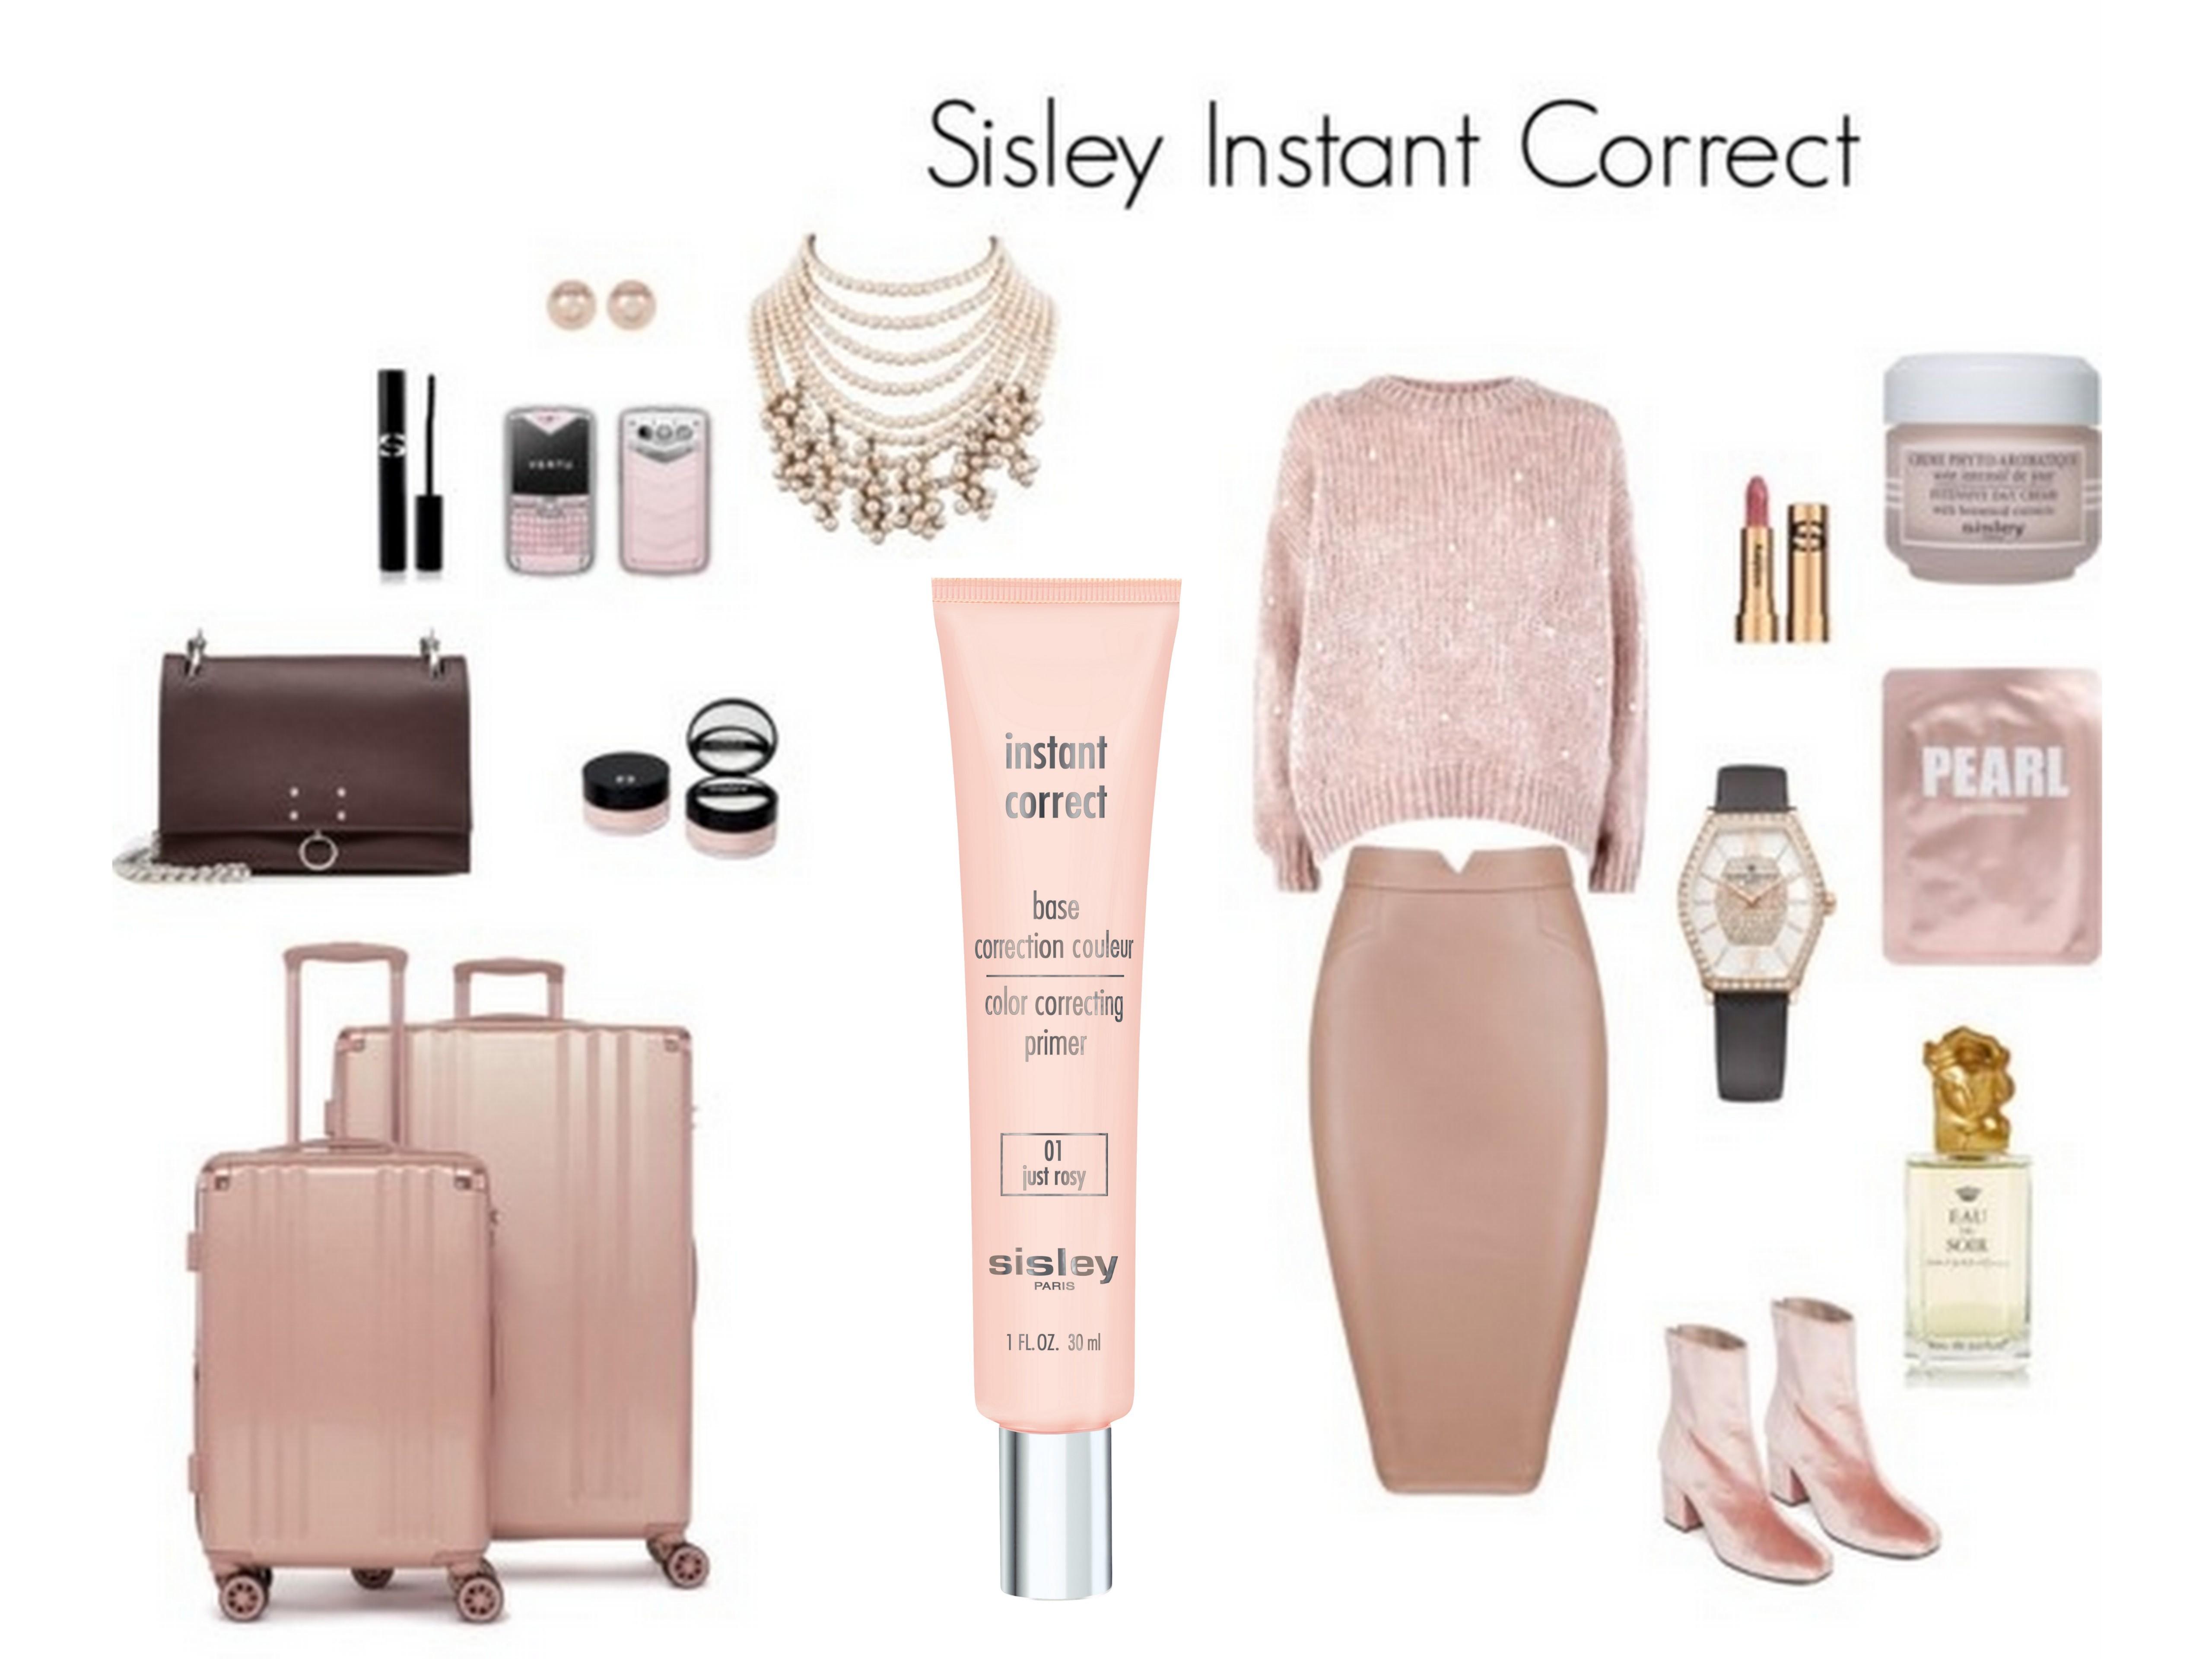 Sisley Instant Correct 01 Just Rosy Праймер для коррекции цвета лица